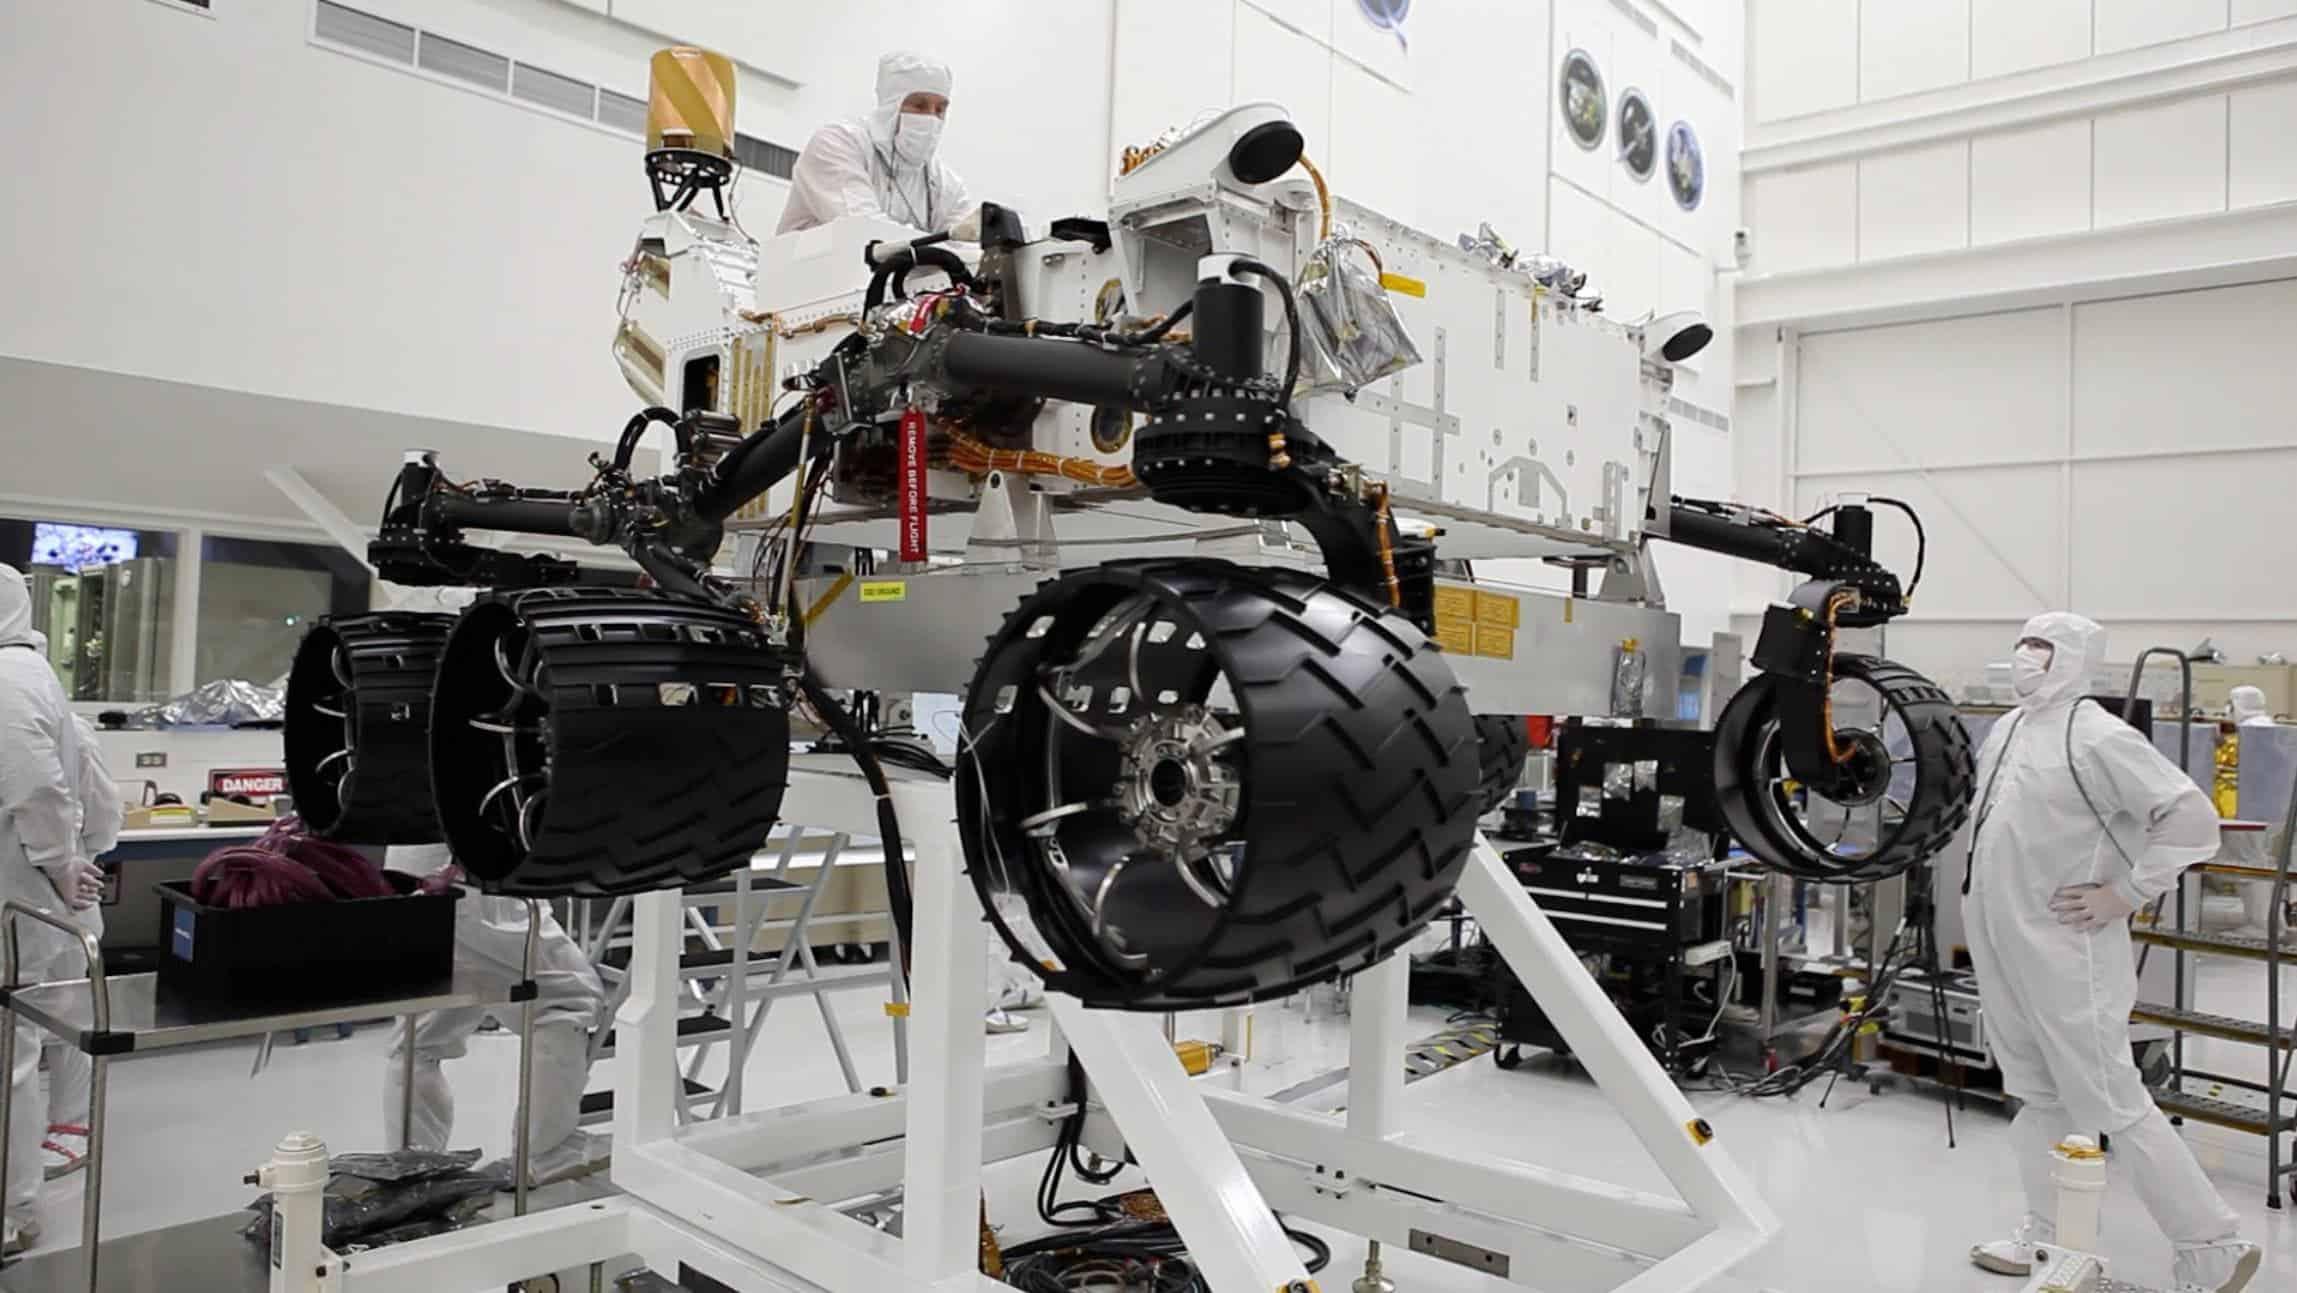 mars exploration rover cost - photo #14